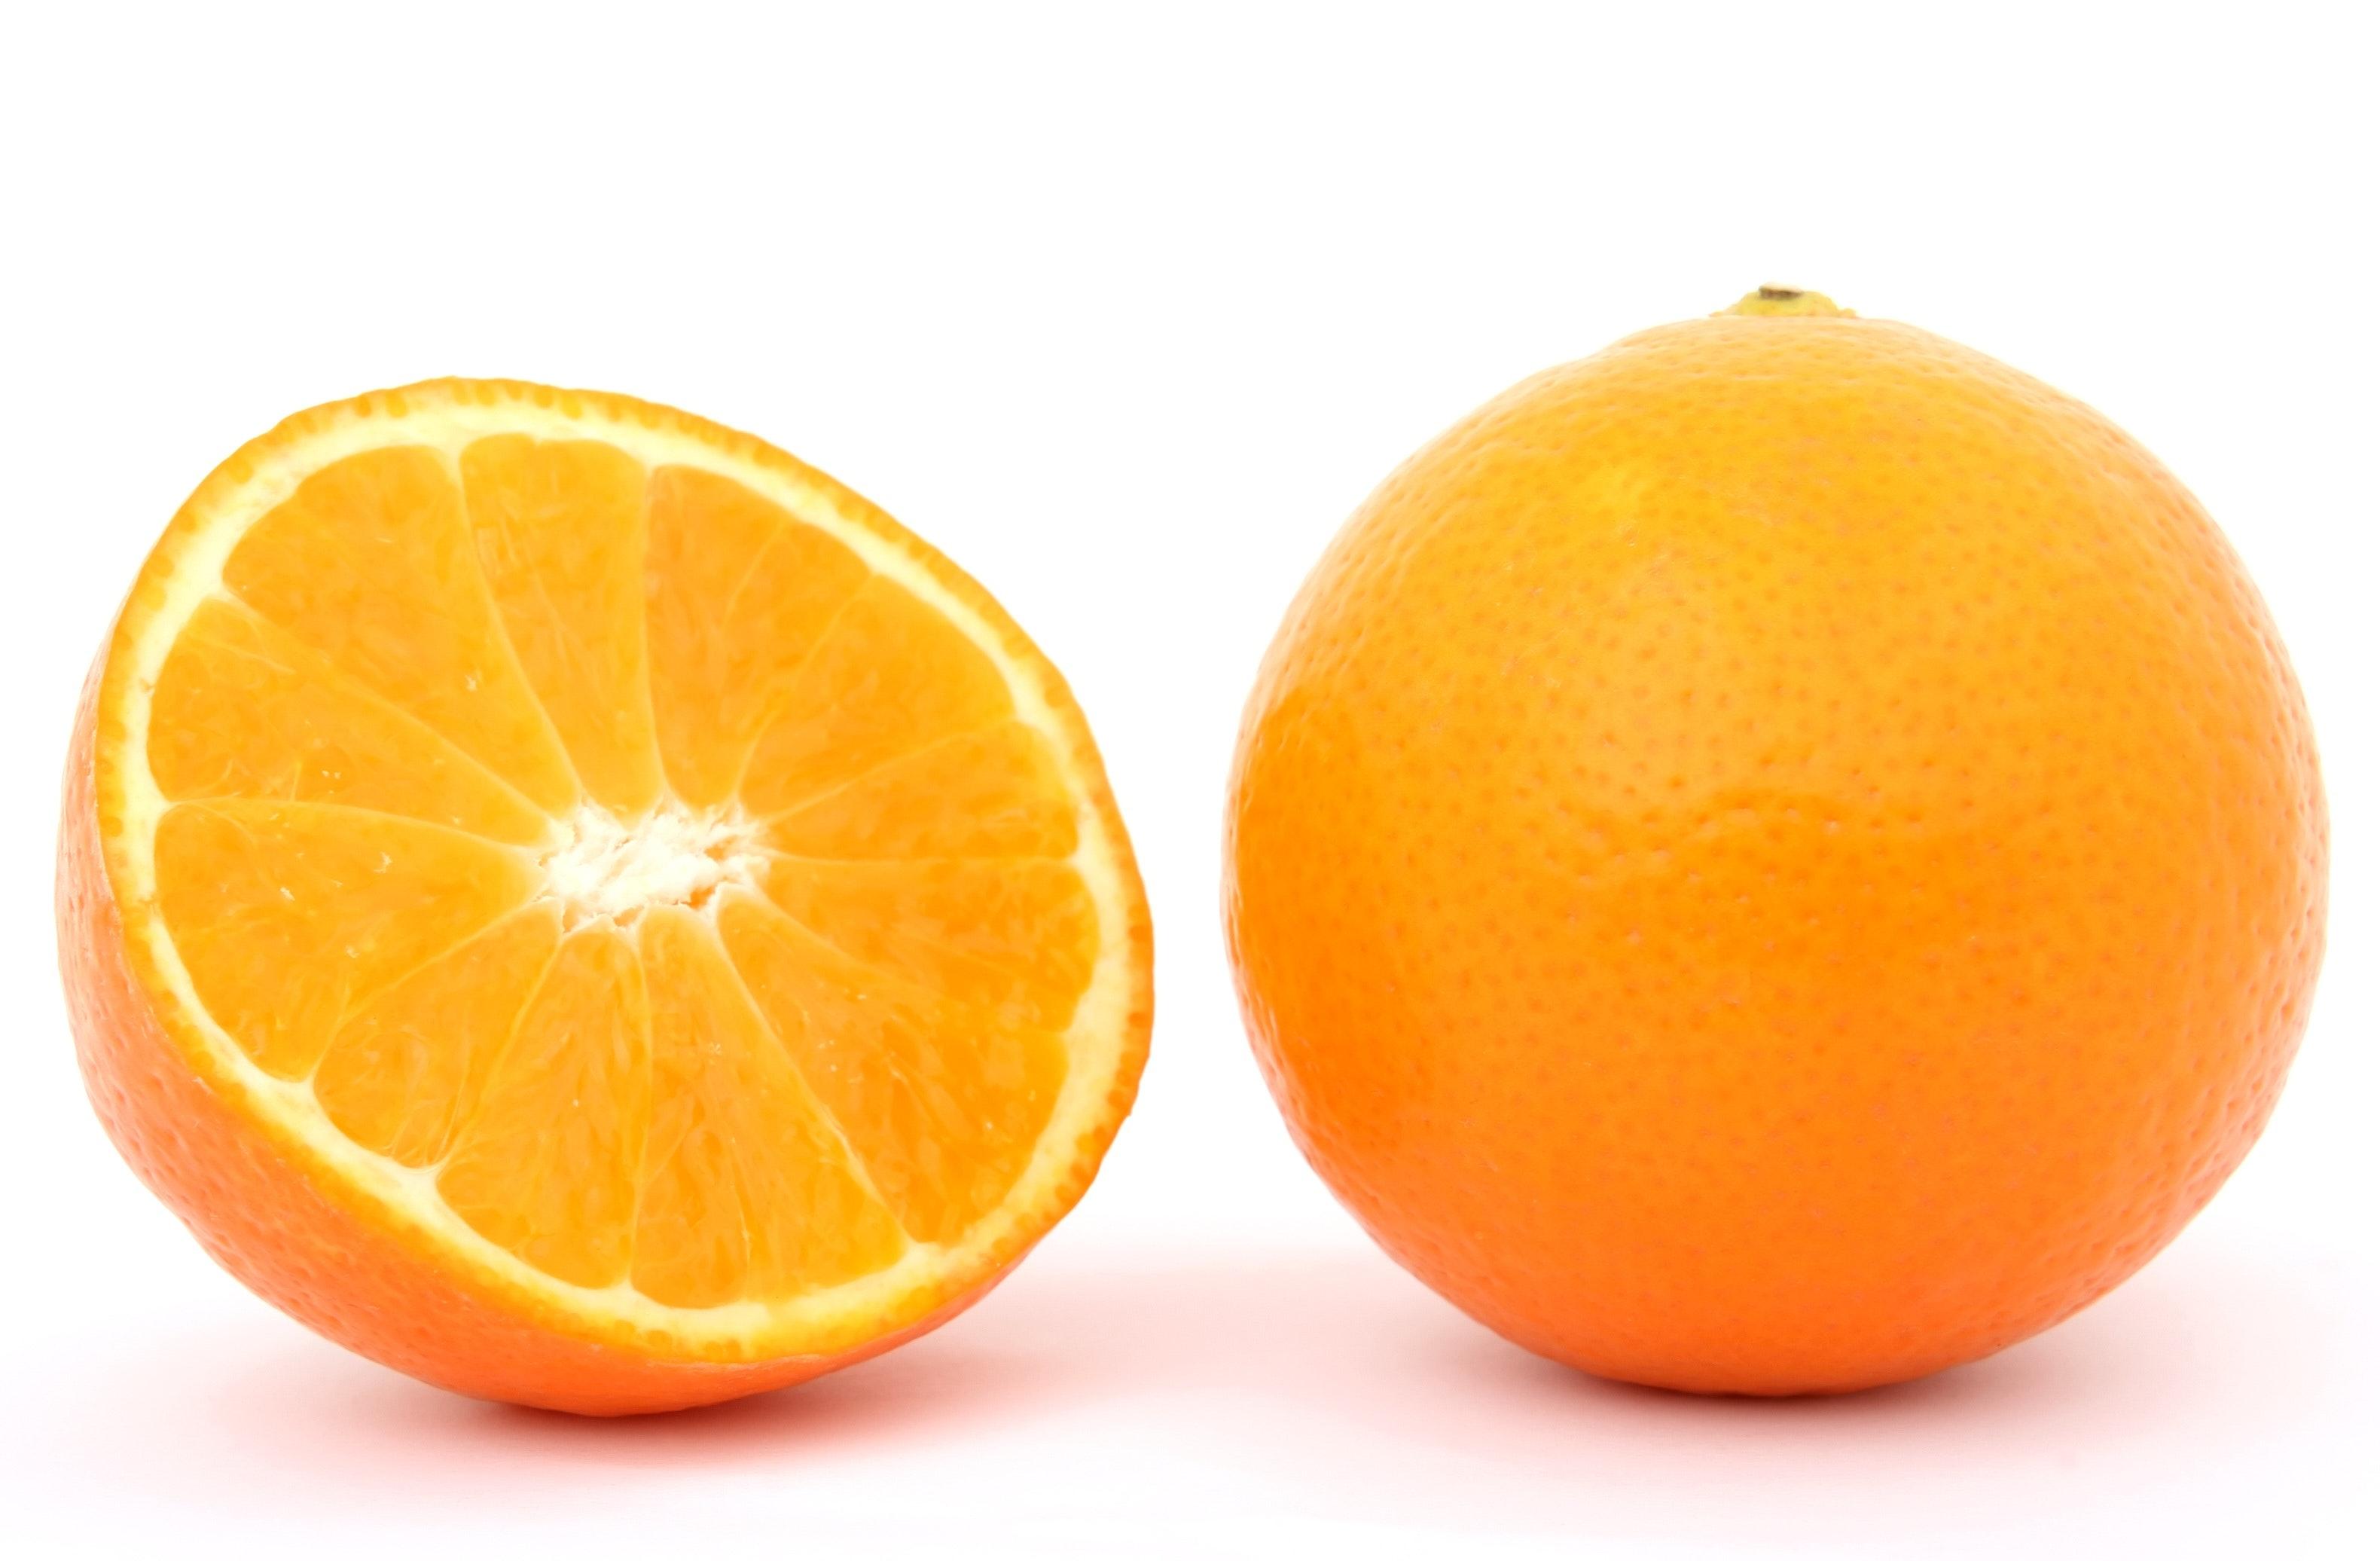 fruit pictures · pexels · free stock photos